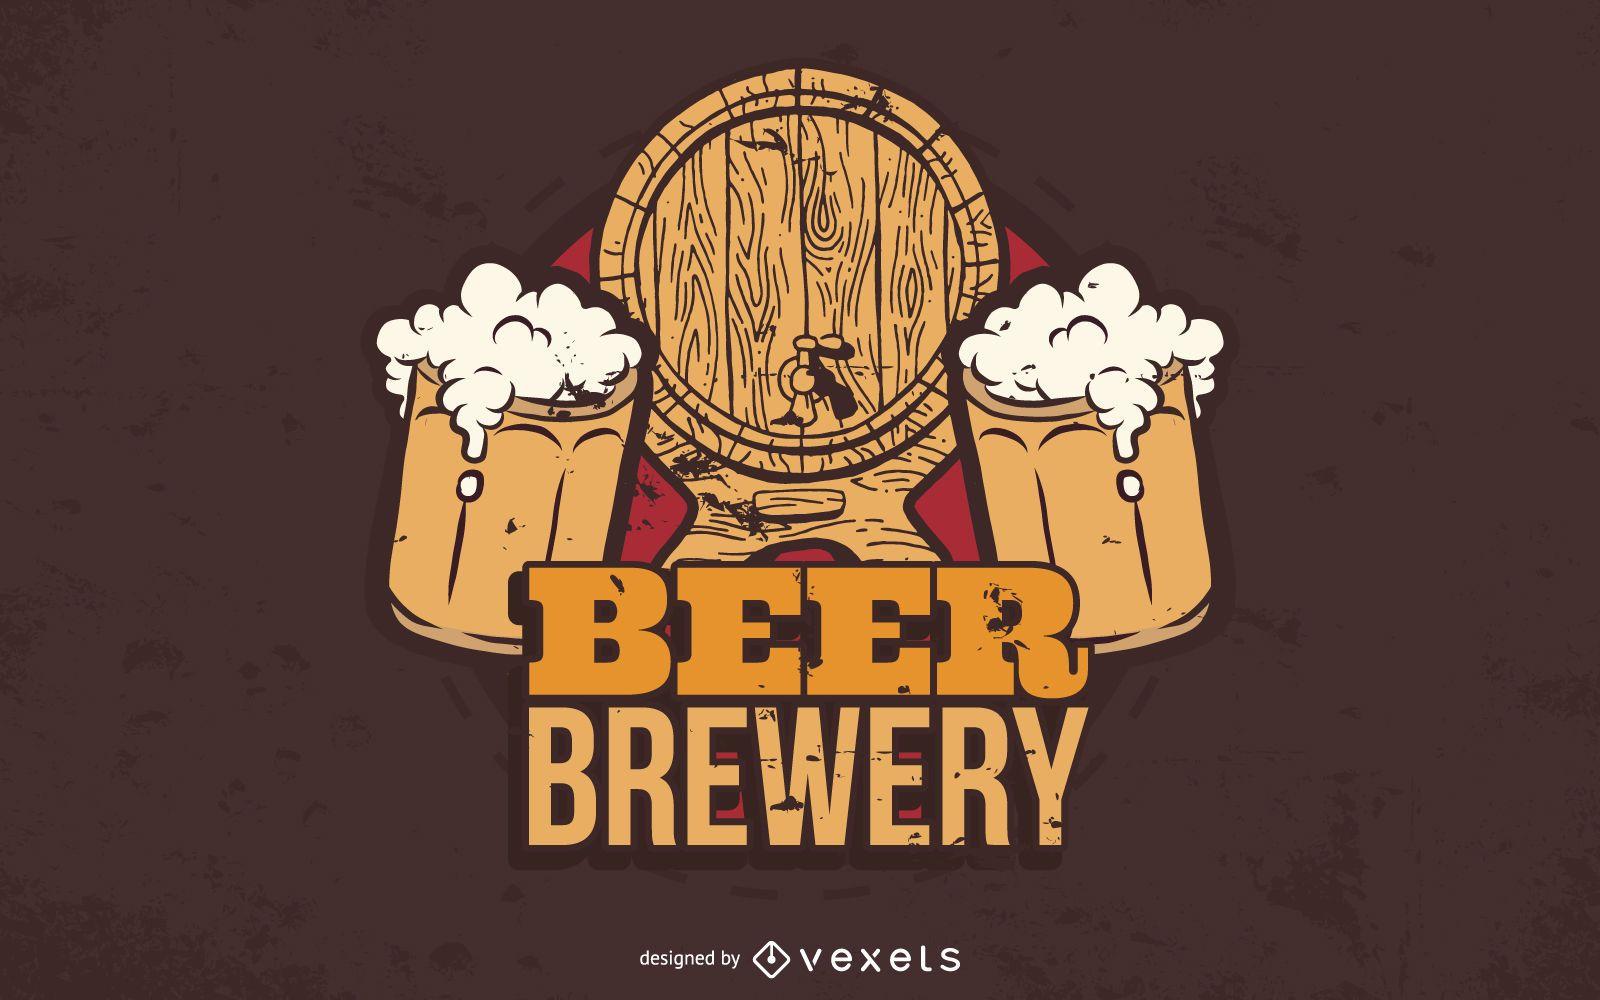 Beer Brewery Vector Graphic